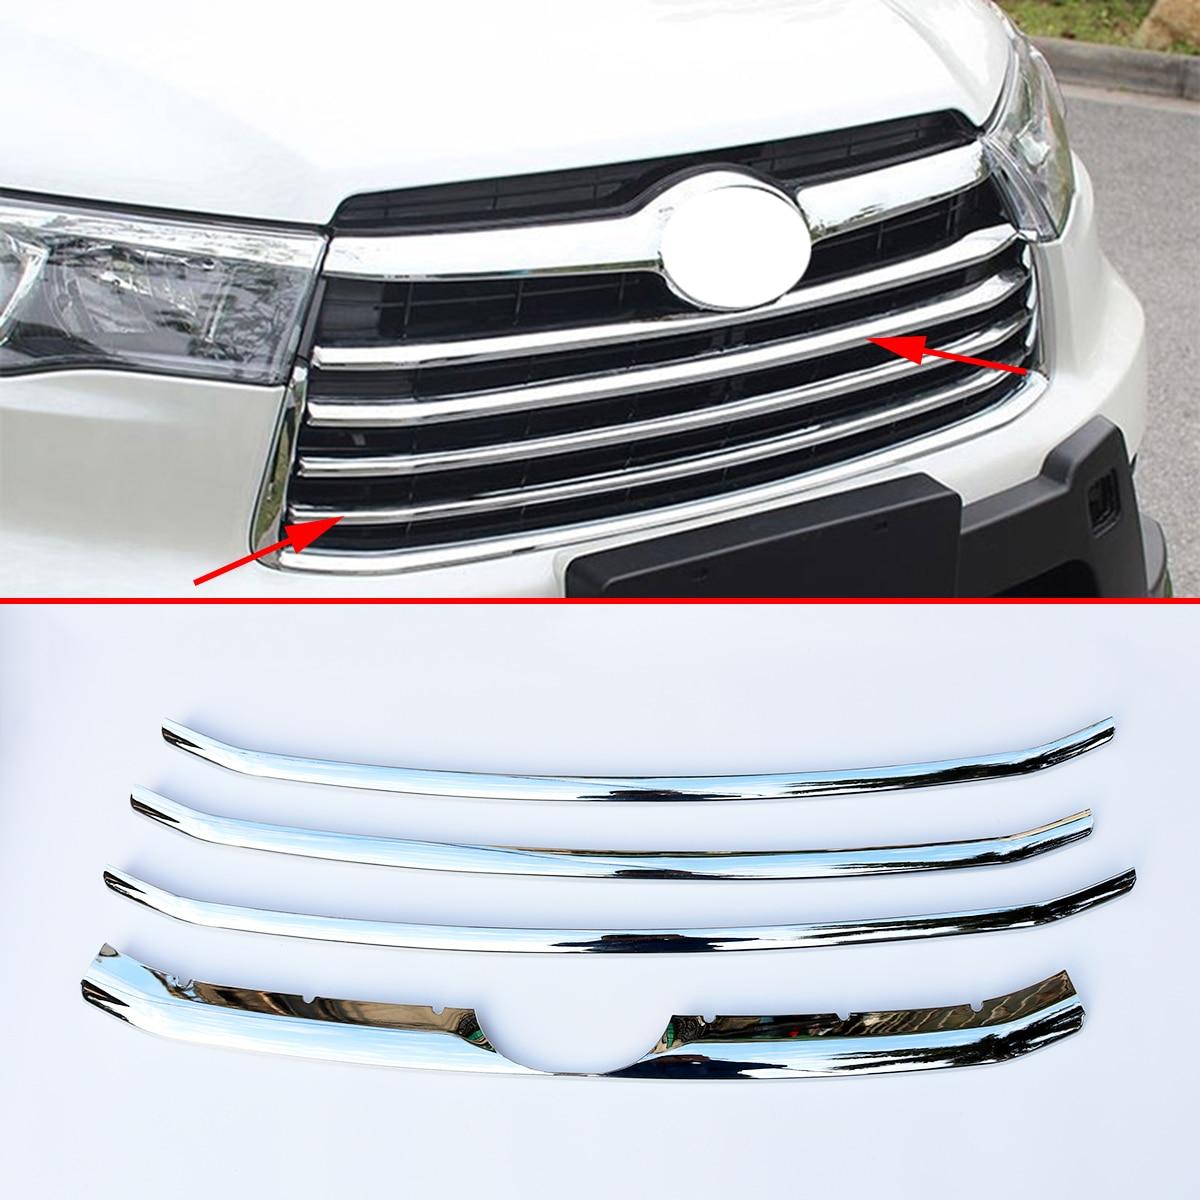 Ajuste cromado para Toyota Highlander cluger accesorios 2014 2015 2016 parrilla frontal paragolpes funda de rayas moldura Exterior